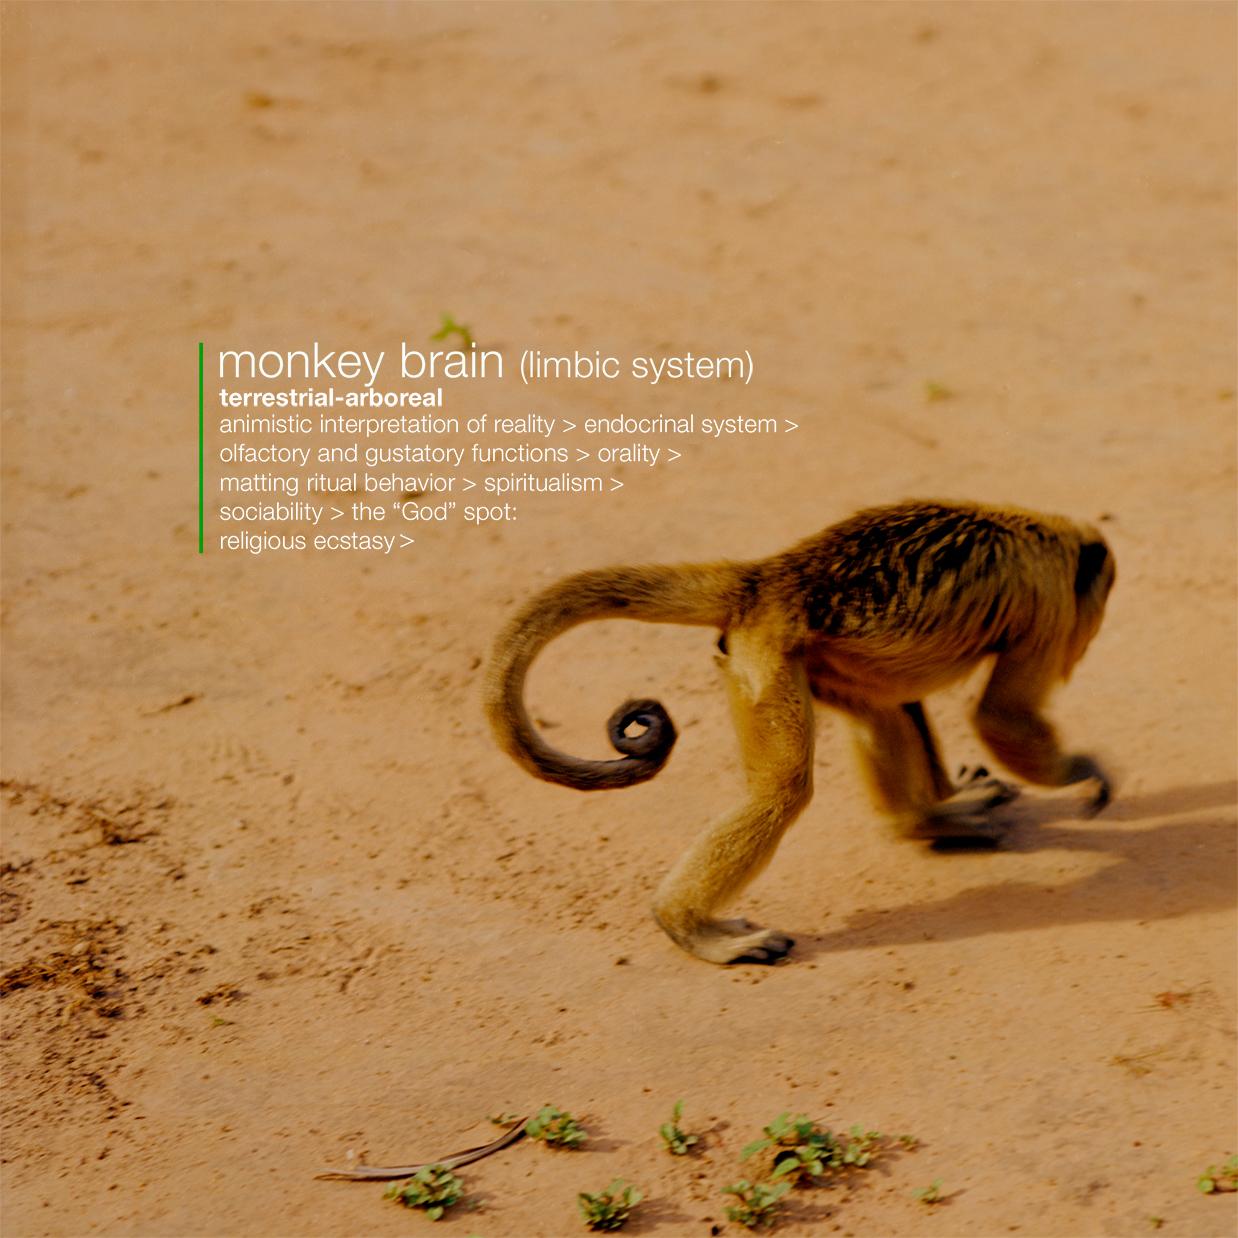 g)-monkey-brain-image-+-text-.jpg